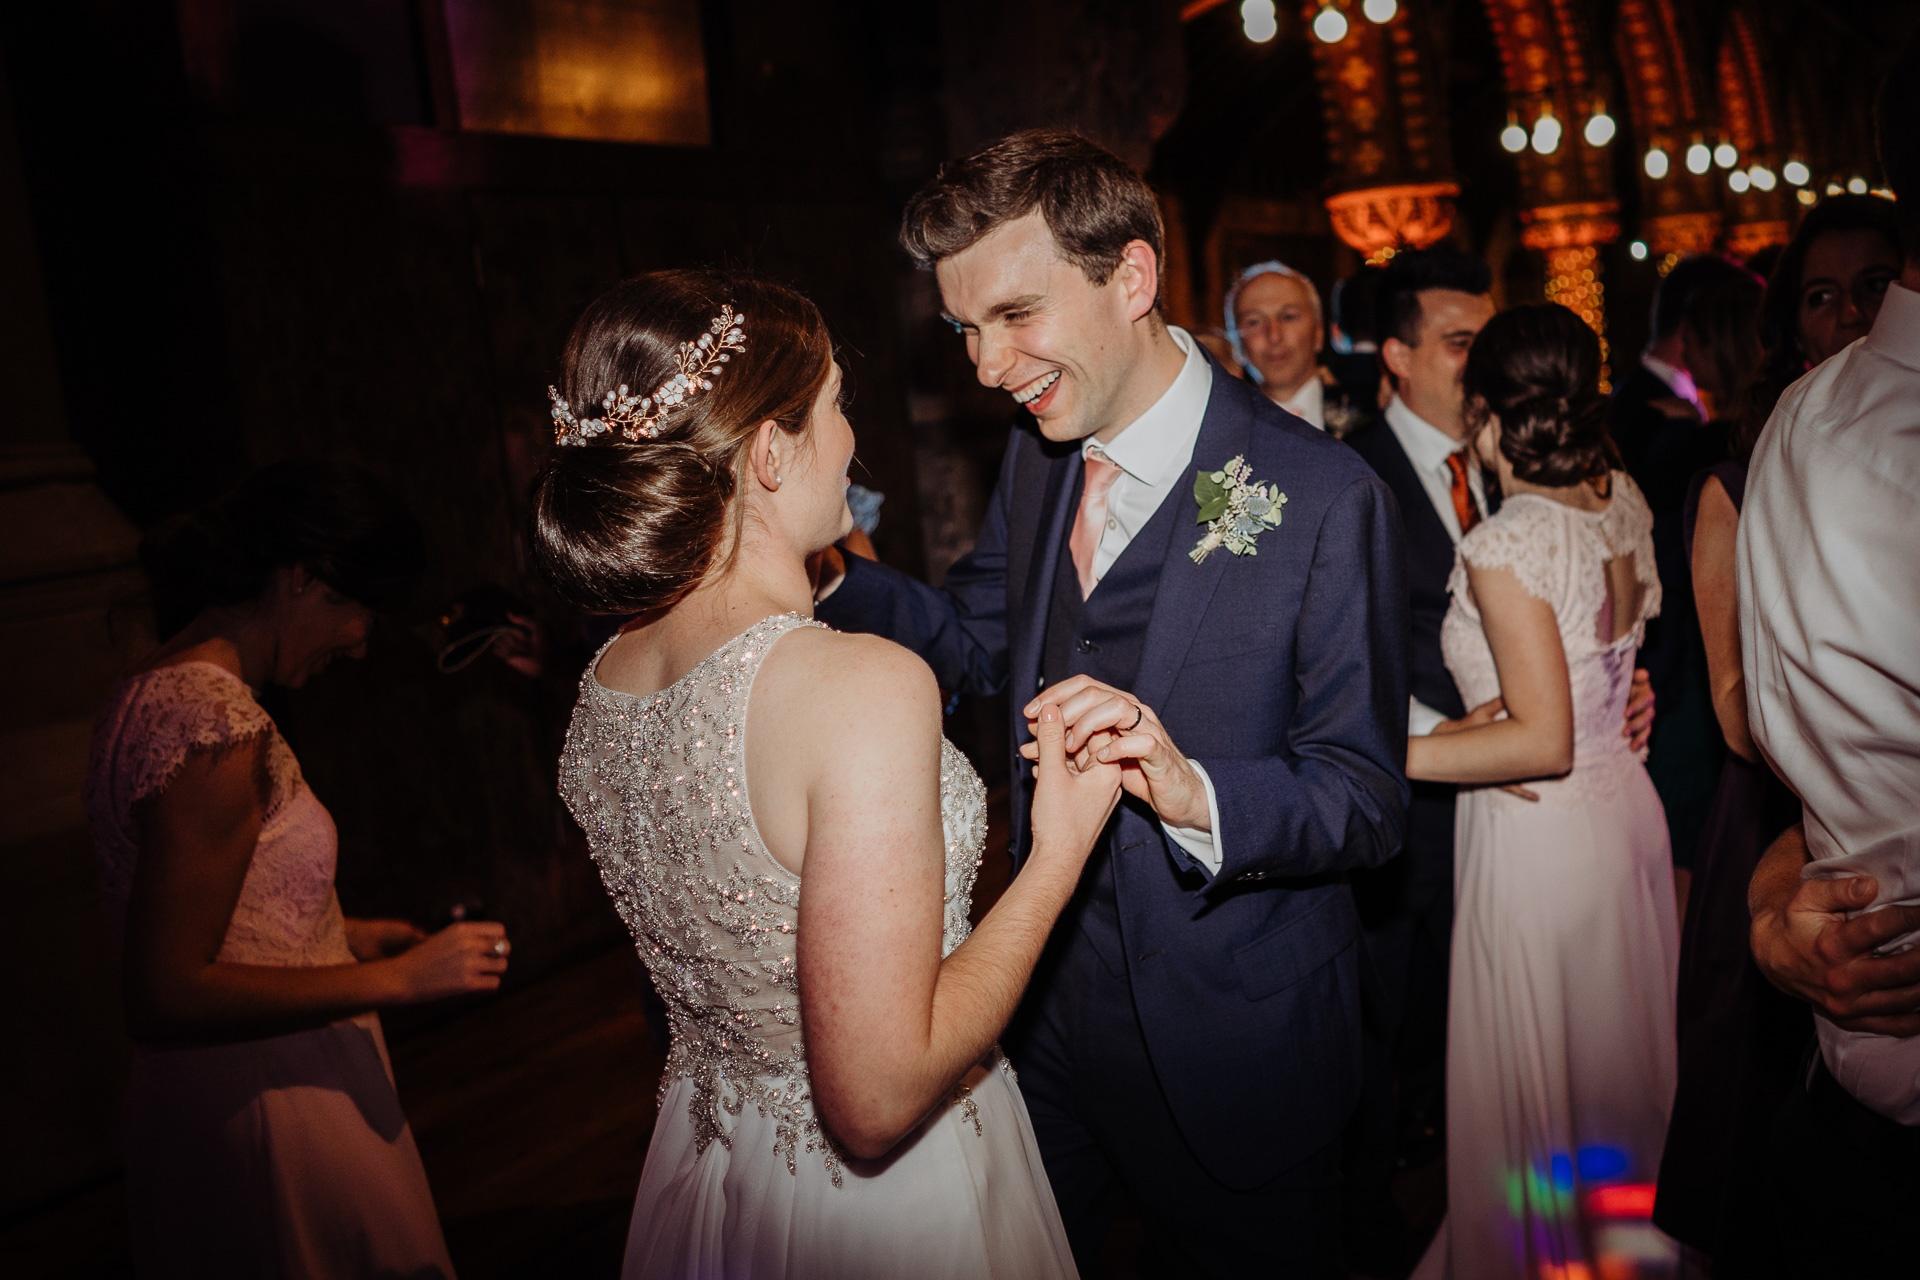 st-stephens-hampstead-wedding-photographer-038